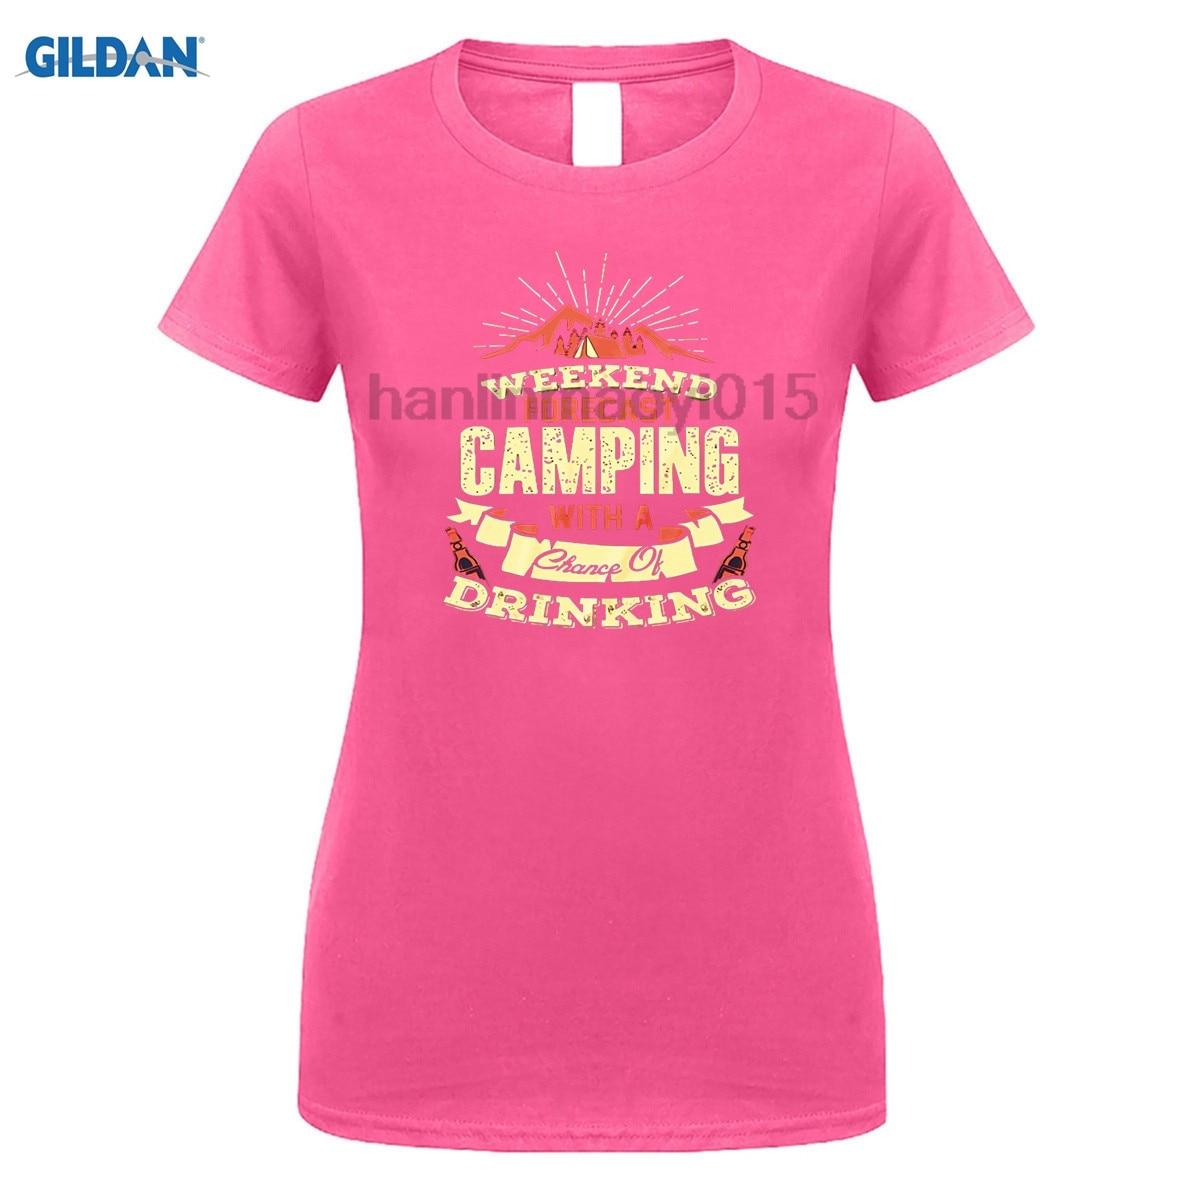 GILDAN printed T-shirt WHAT HAPPENS AROUND THE CAMPFIRE t-shirt for women